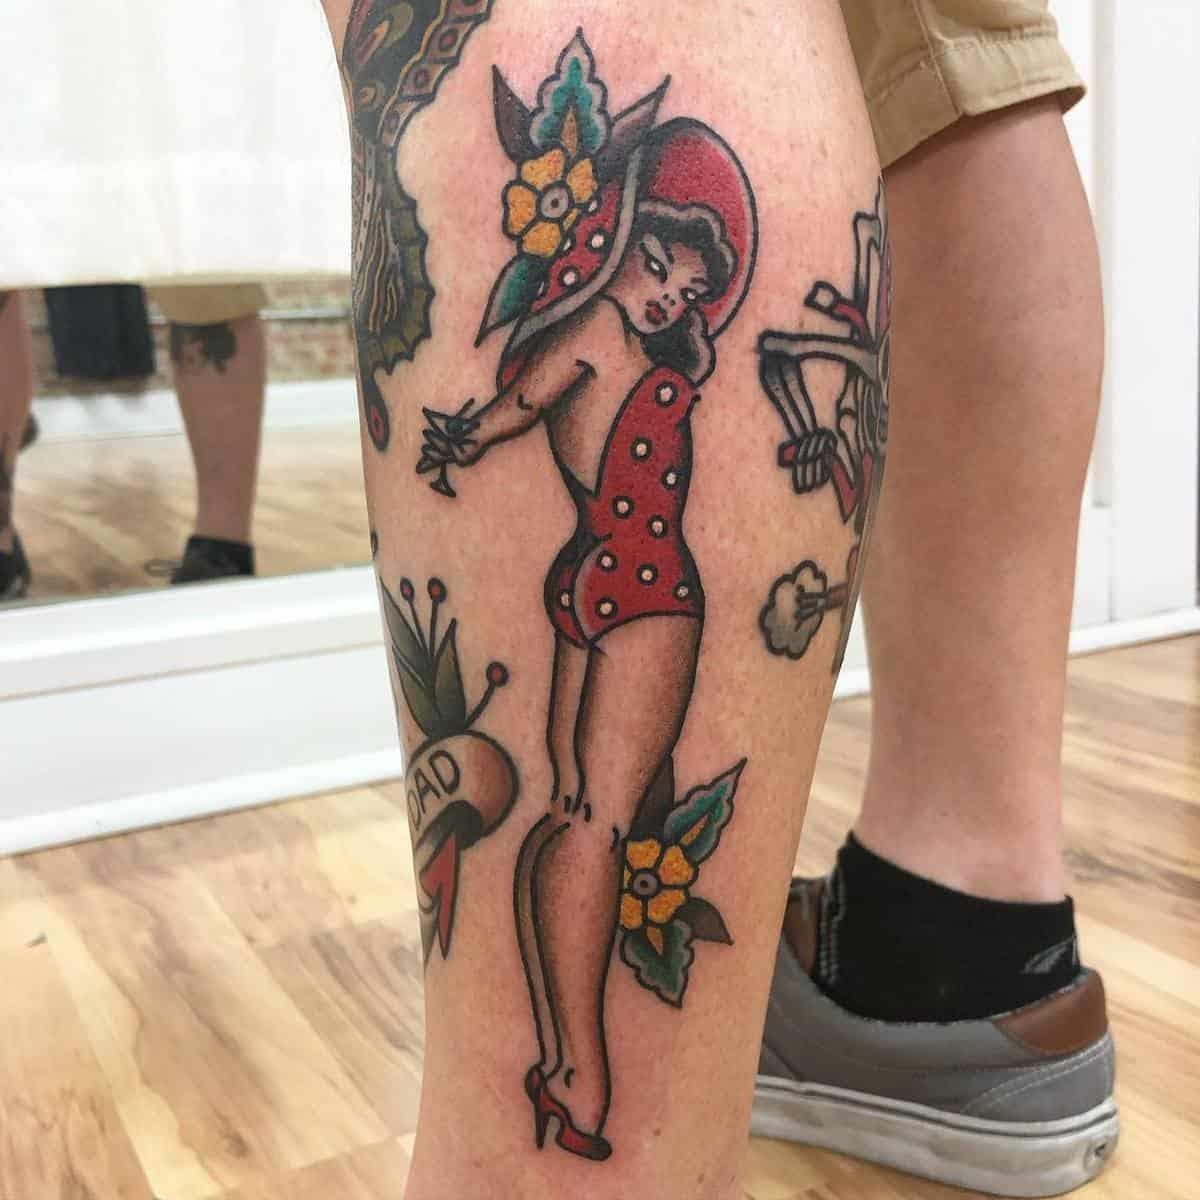 Sailor Jerry Pin Up Girl Tattoo -lukeworleytattoo